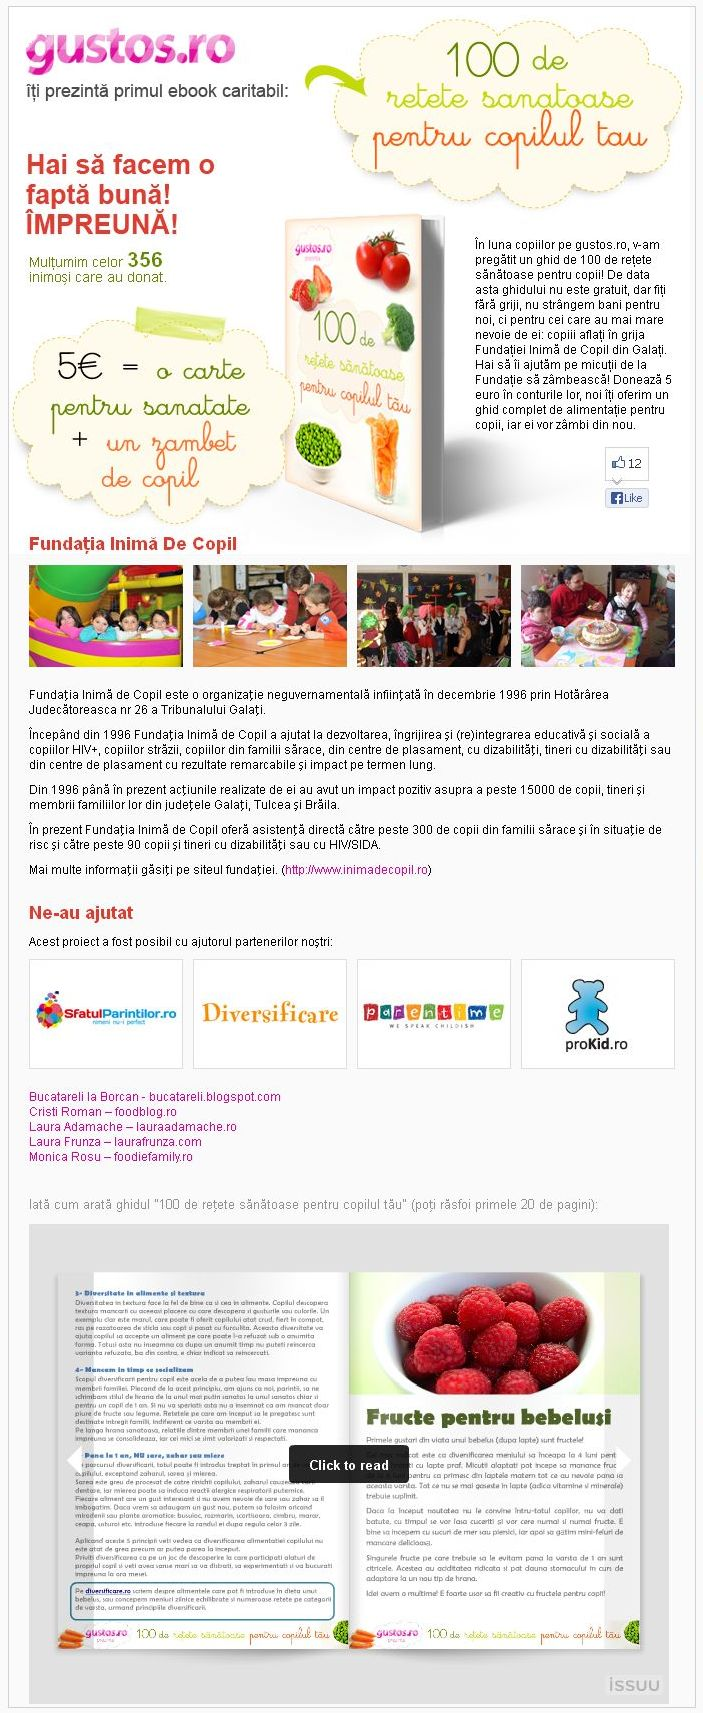 FireShot Screen Capture #063 - 'Mancare pentru copii sanatosi' - www_gustos_ro_copii_carte-cu-retete